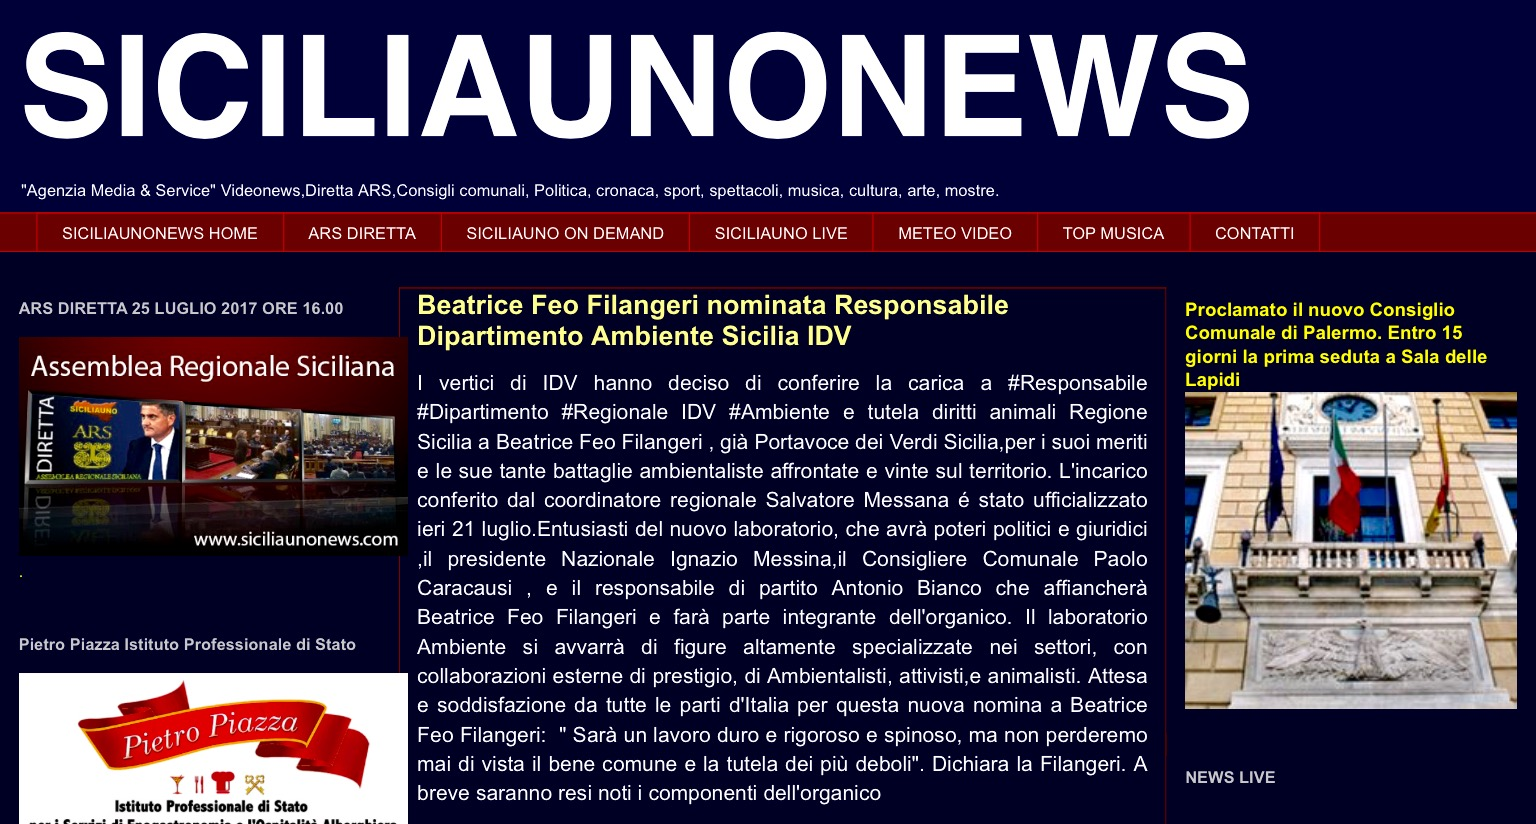 Dipartimento Ambiente IDV Sicilia a Beatrice Feo Filangeri